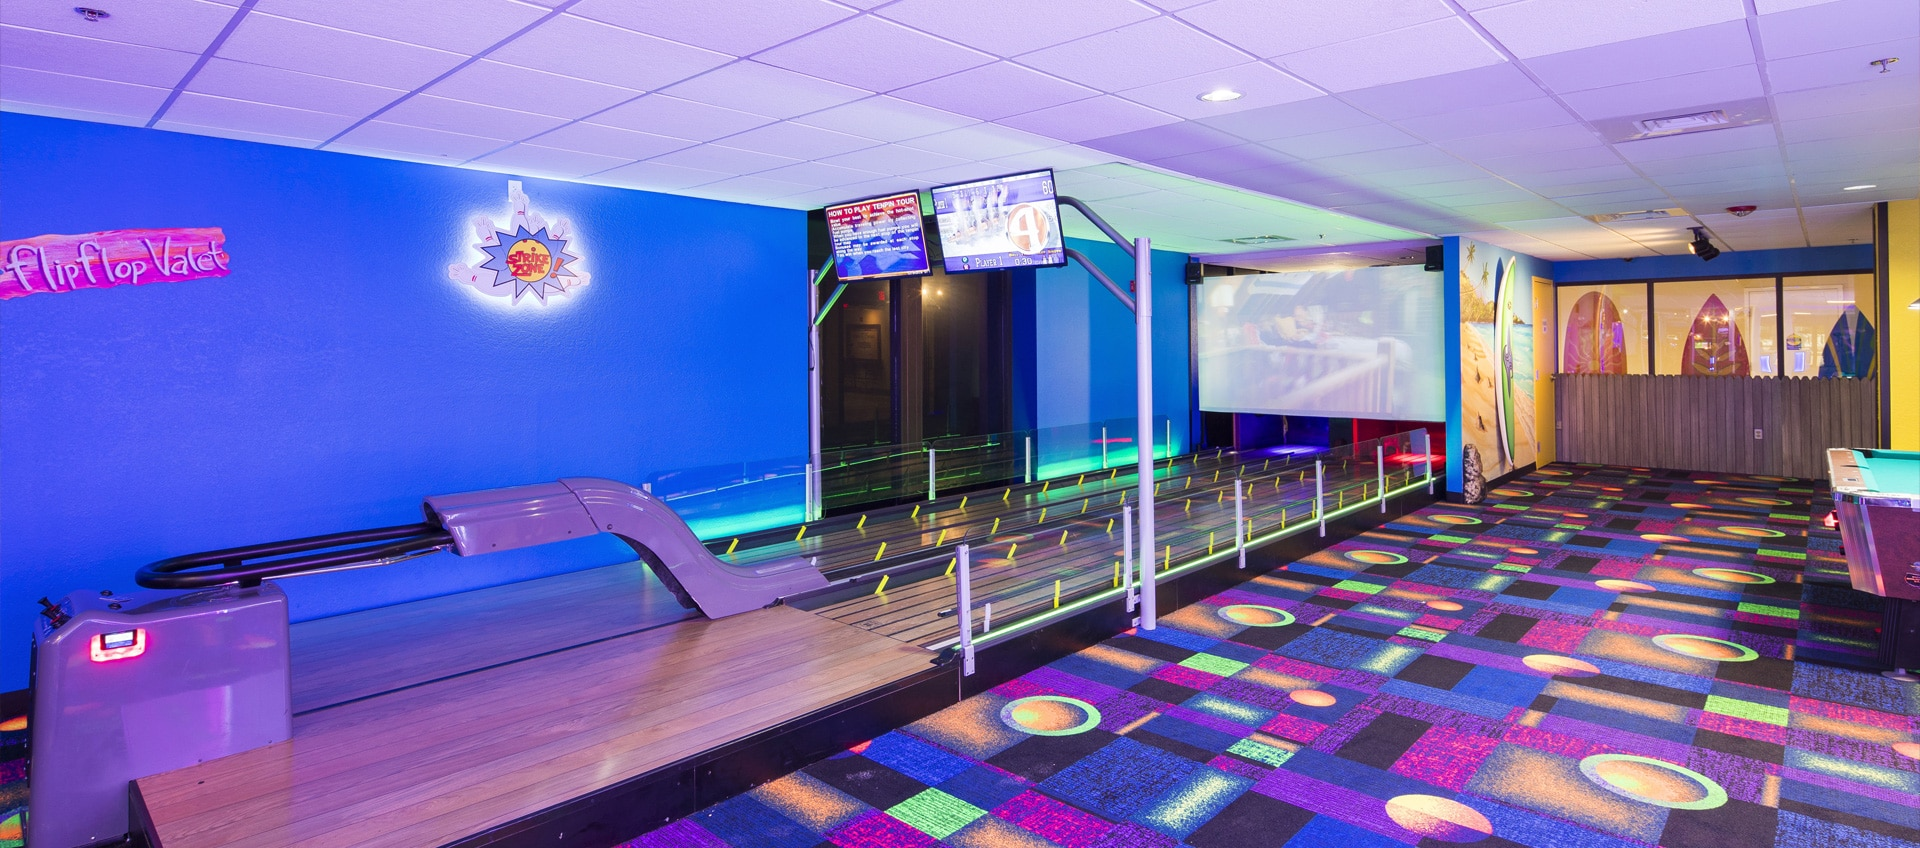 fun arcade room